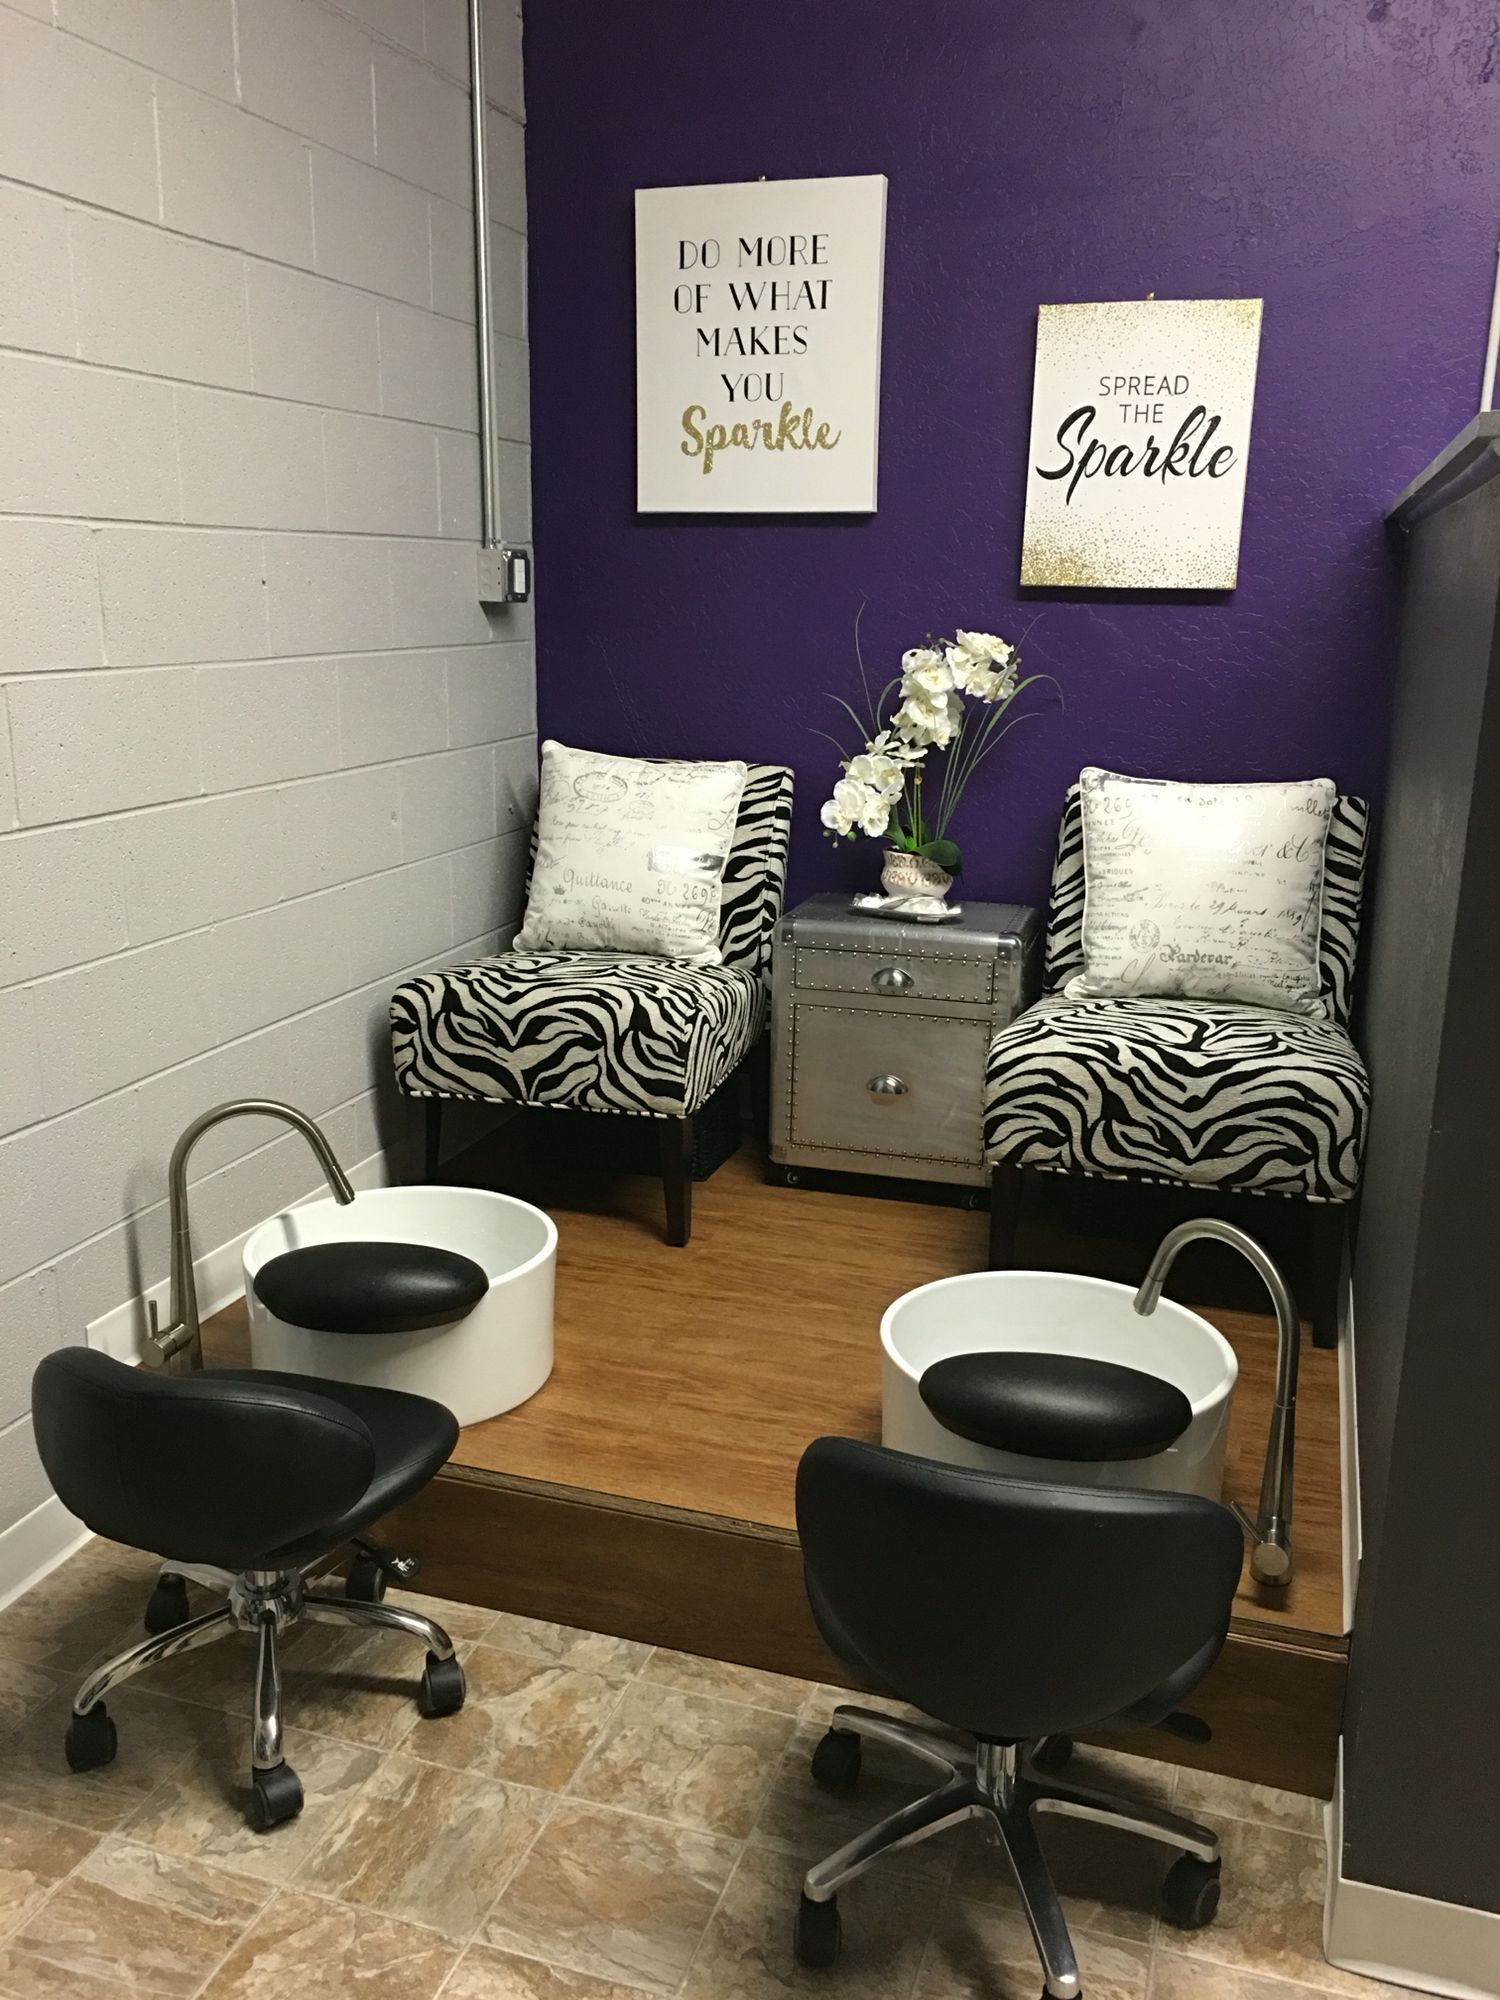 Home Spa Design Ideas: Pedicure Station/Très Chic Hair & Nail Salon Missoula, MT